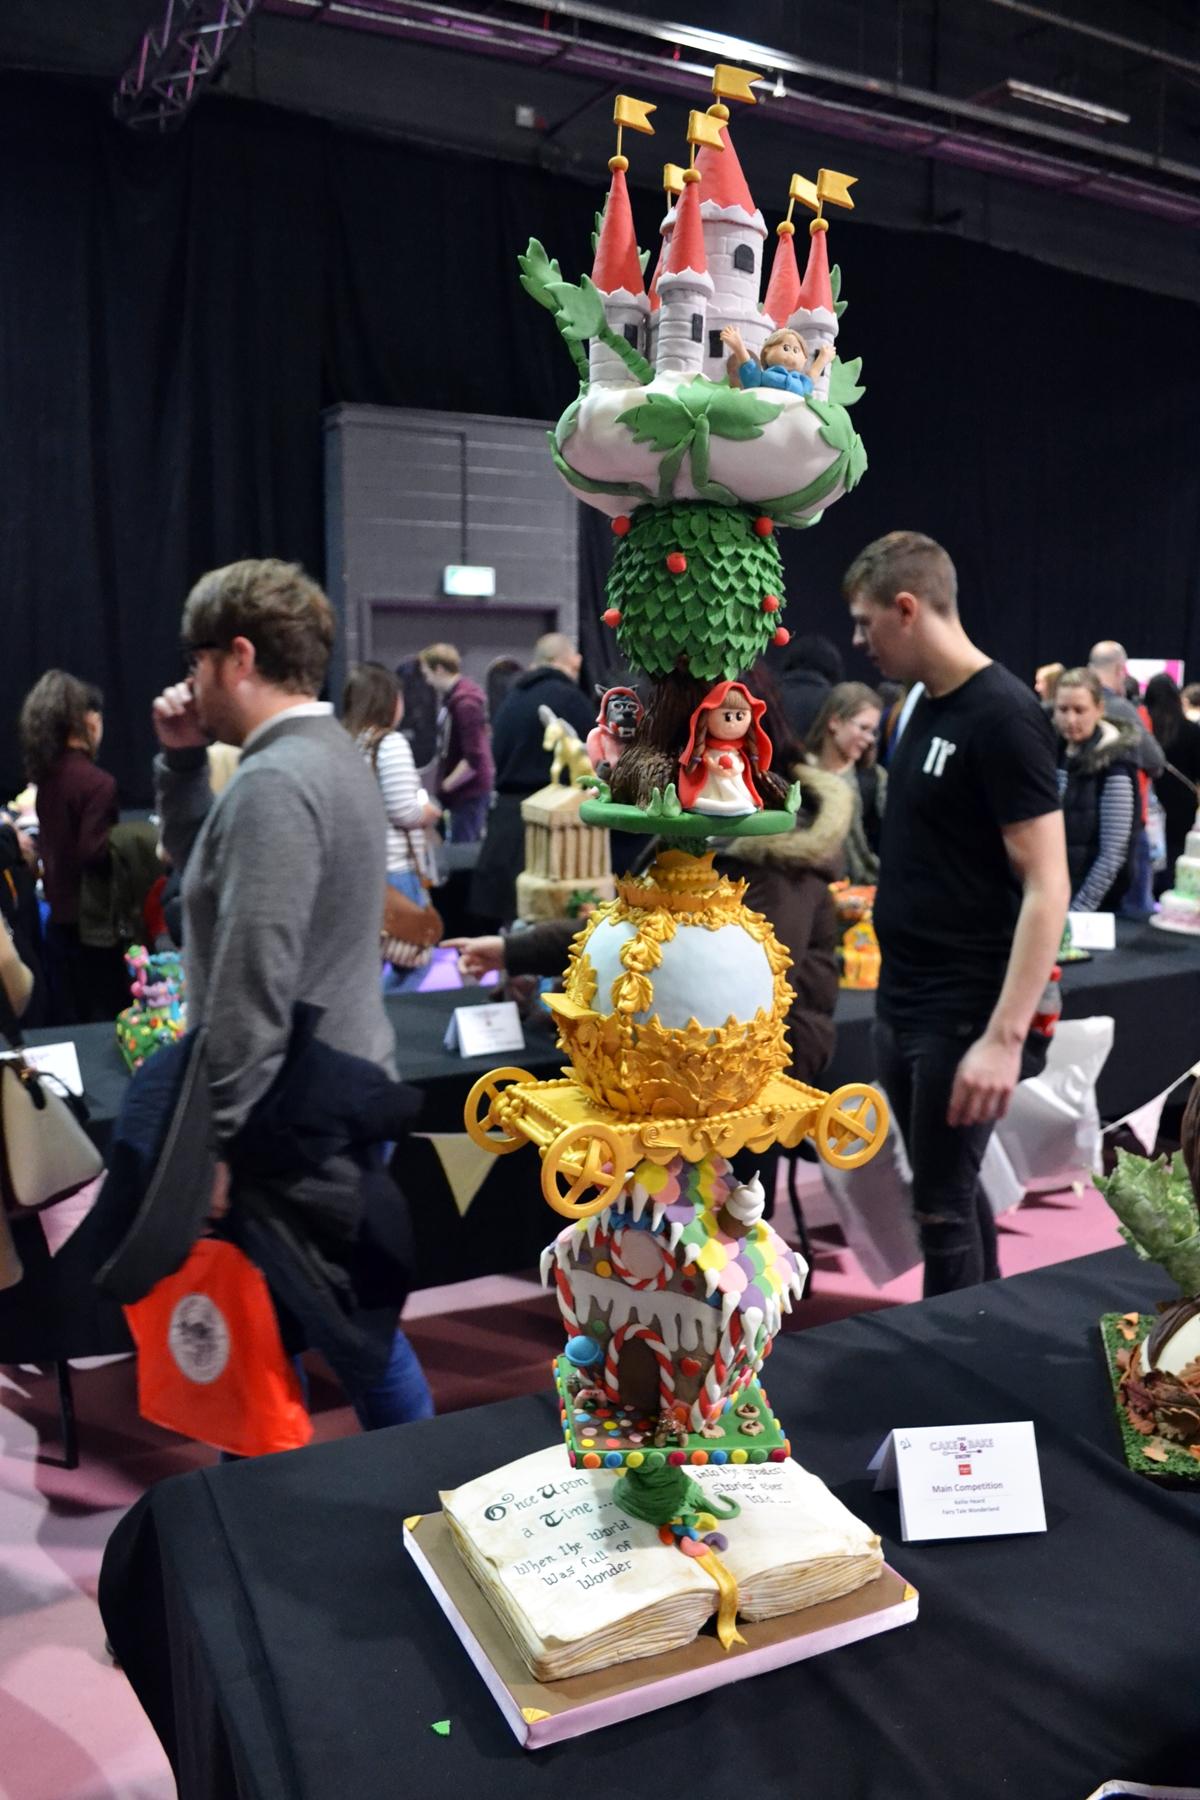 cake and bake show event city manchester 2016 cake show